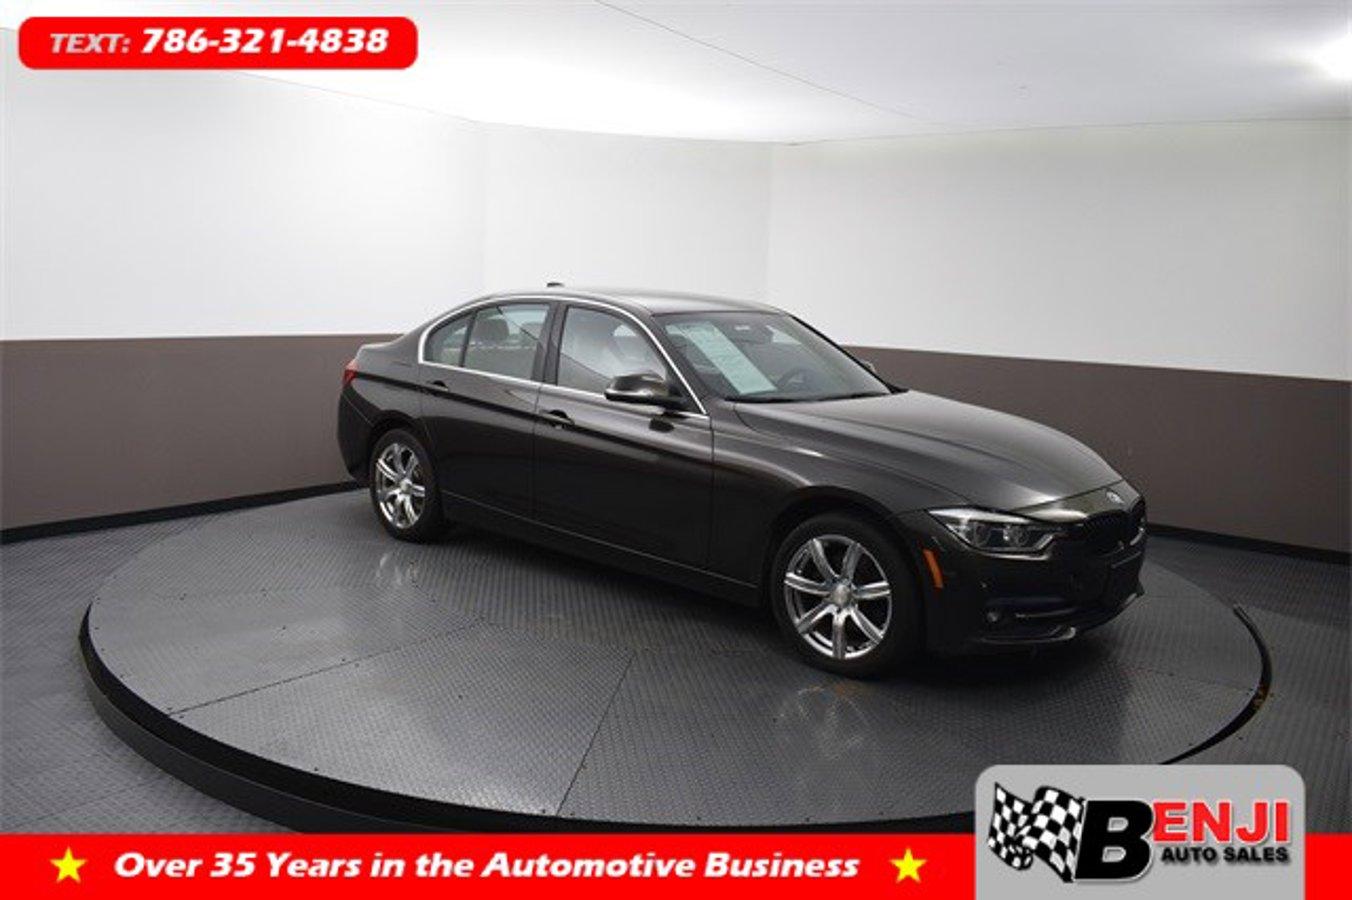 Used BMW 3-SERIES 2018 BROWARD 330I